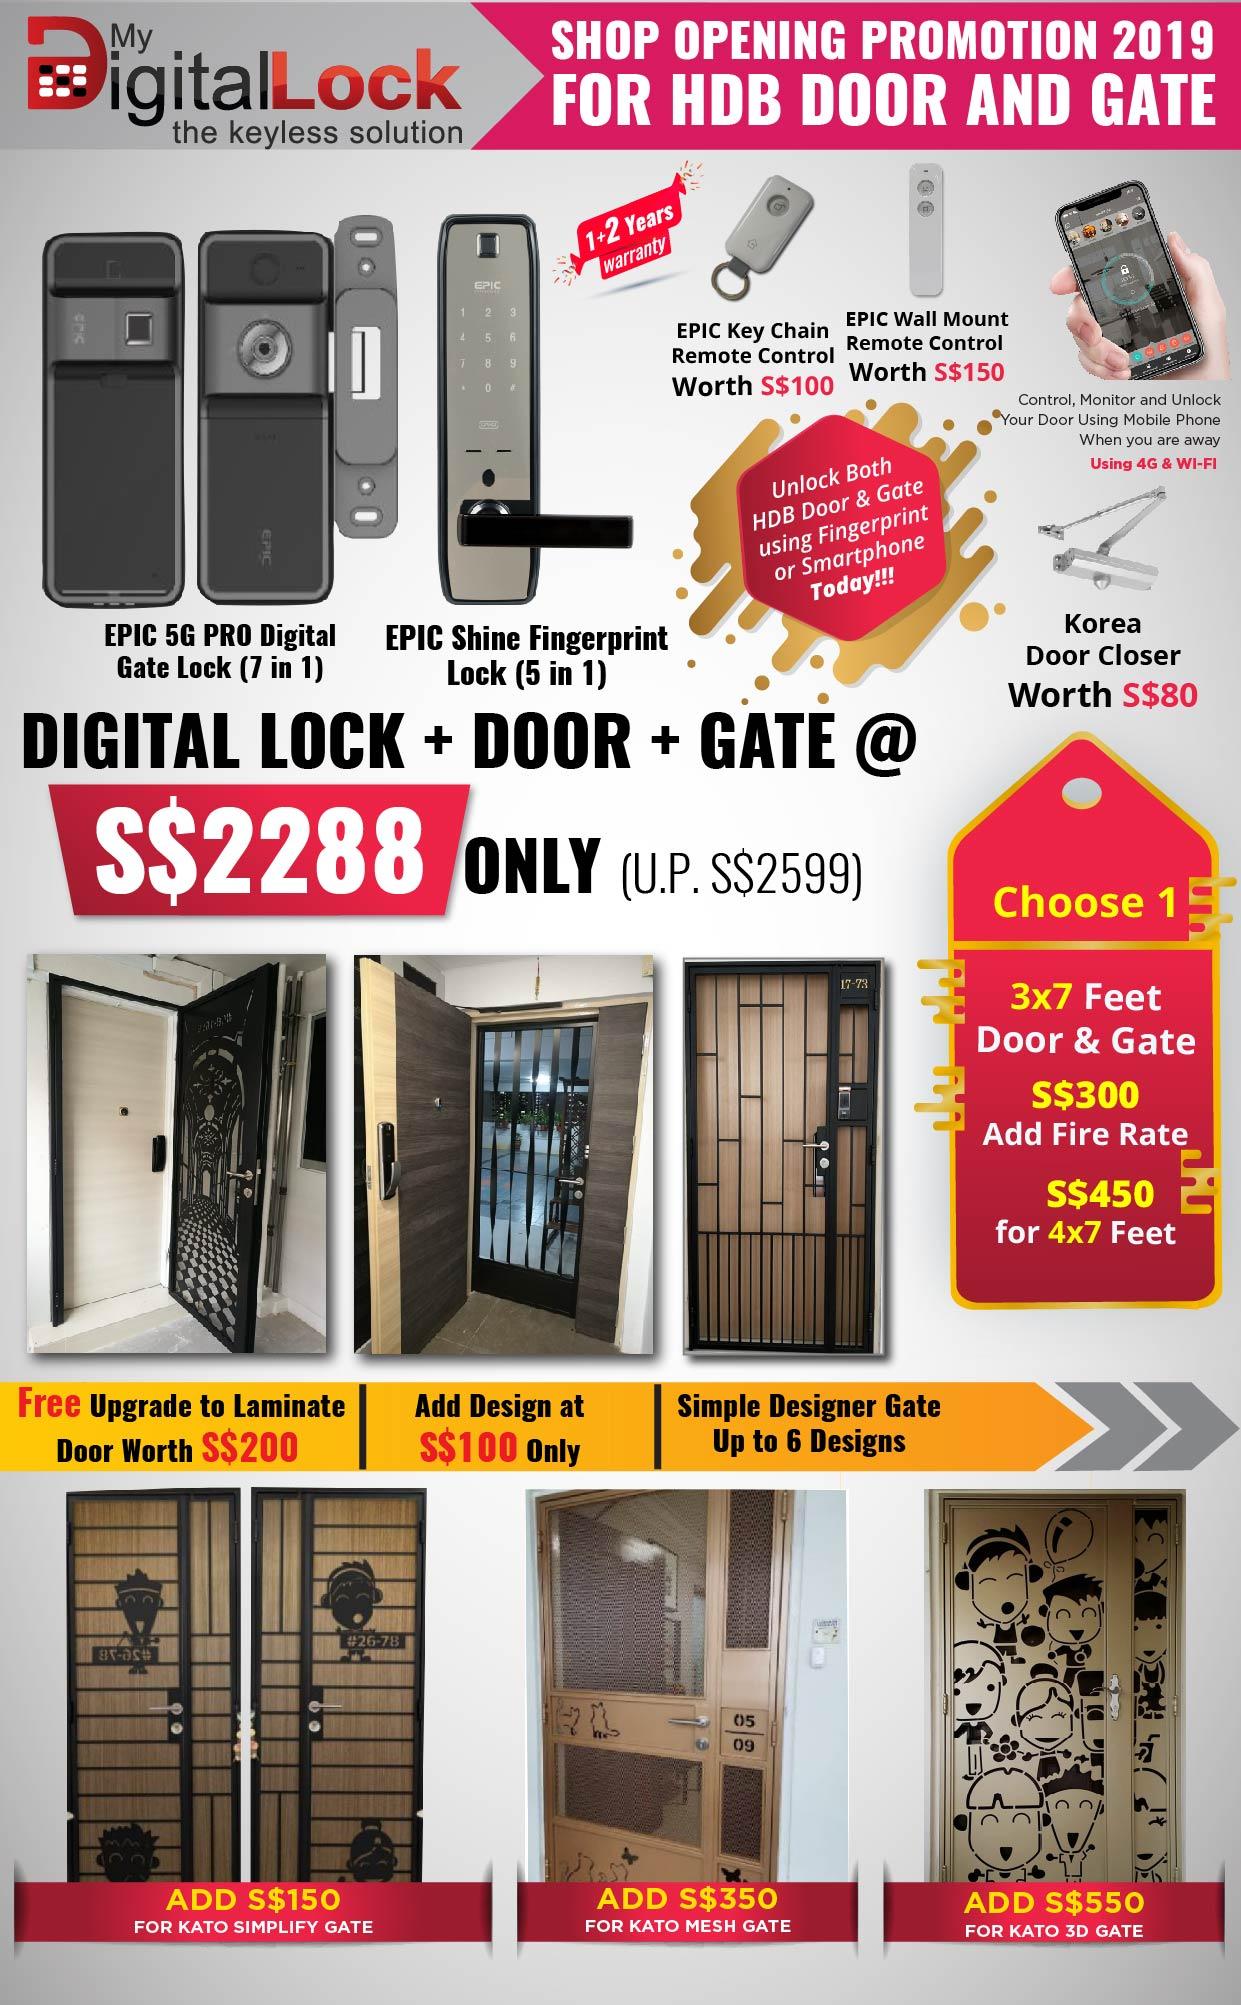 EPIC-5G-Pro-Digital-Gate-Lock